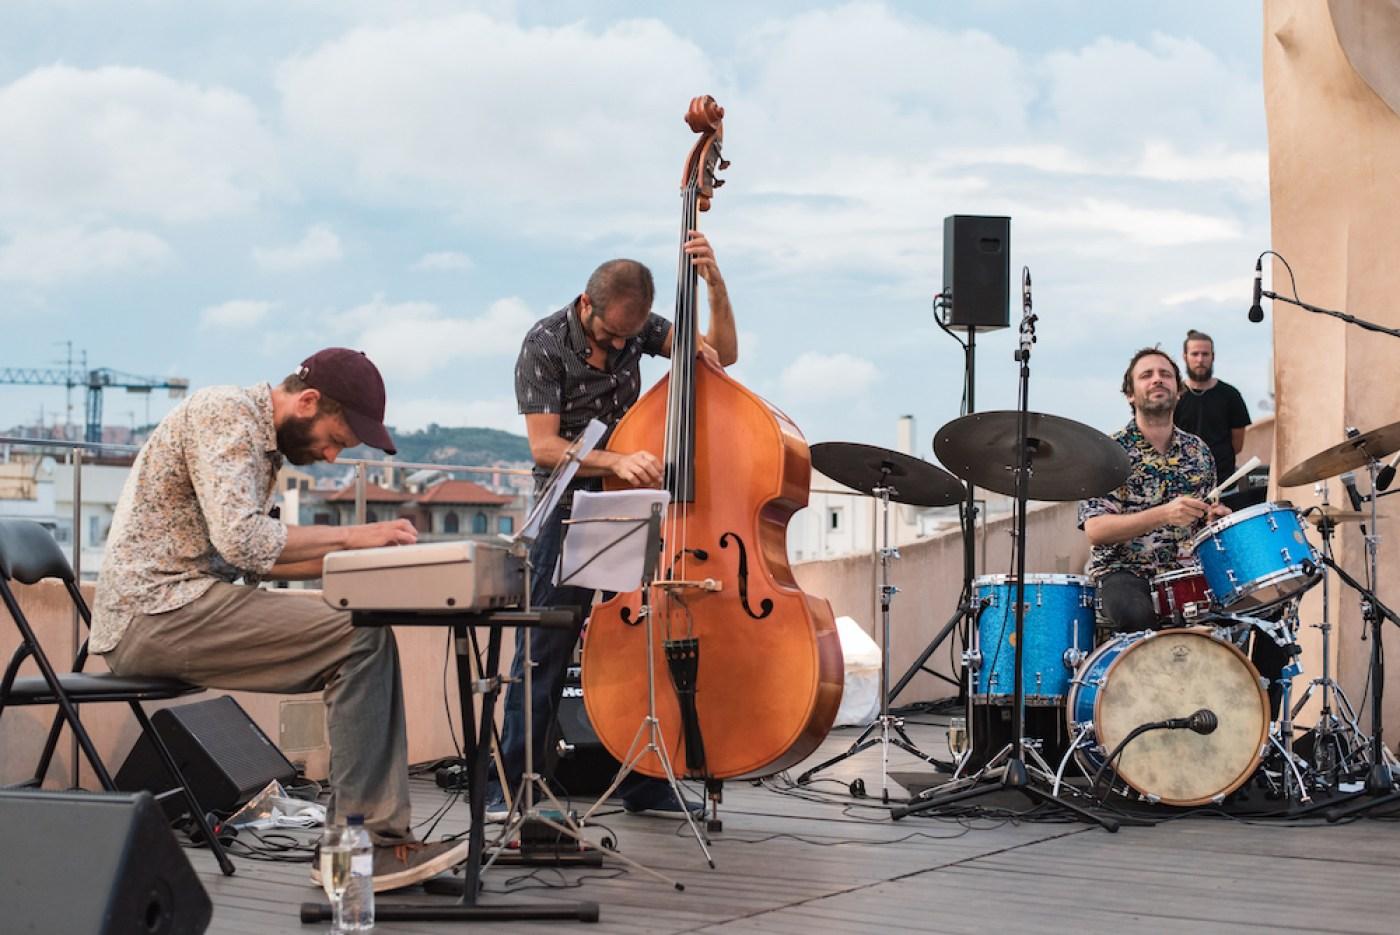 Live jazz music concert on the rooftop terrace of Antoni Gaudi's Casa Mila building in Barcelona